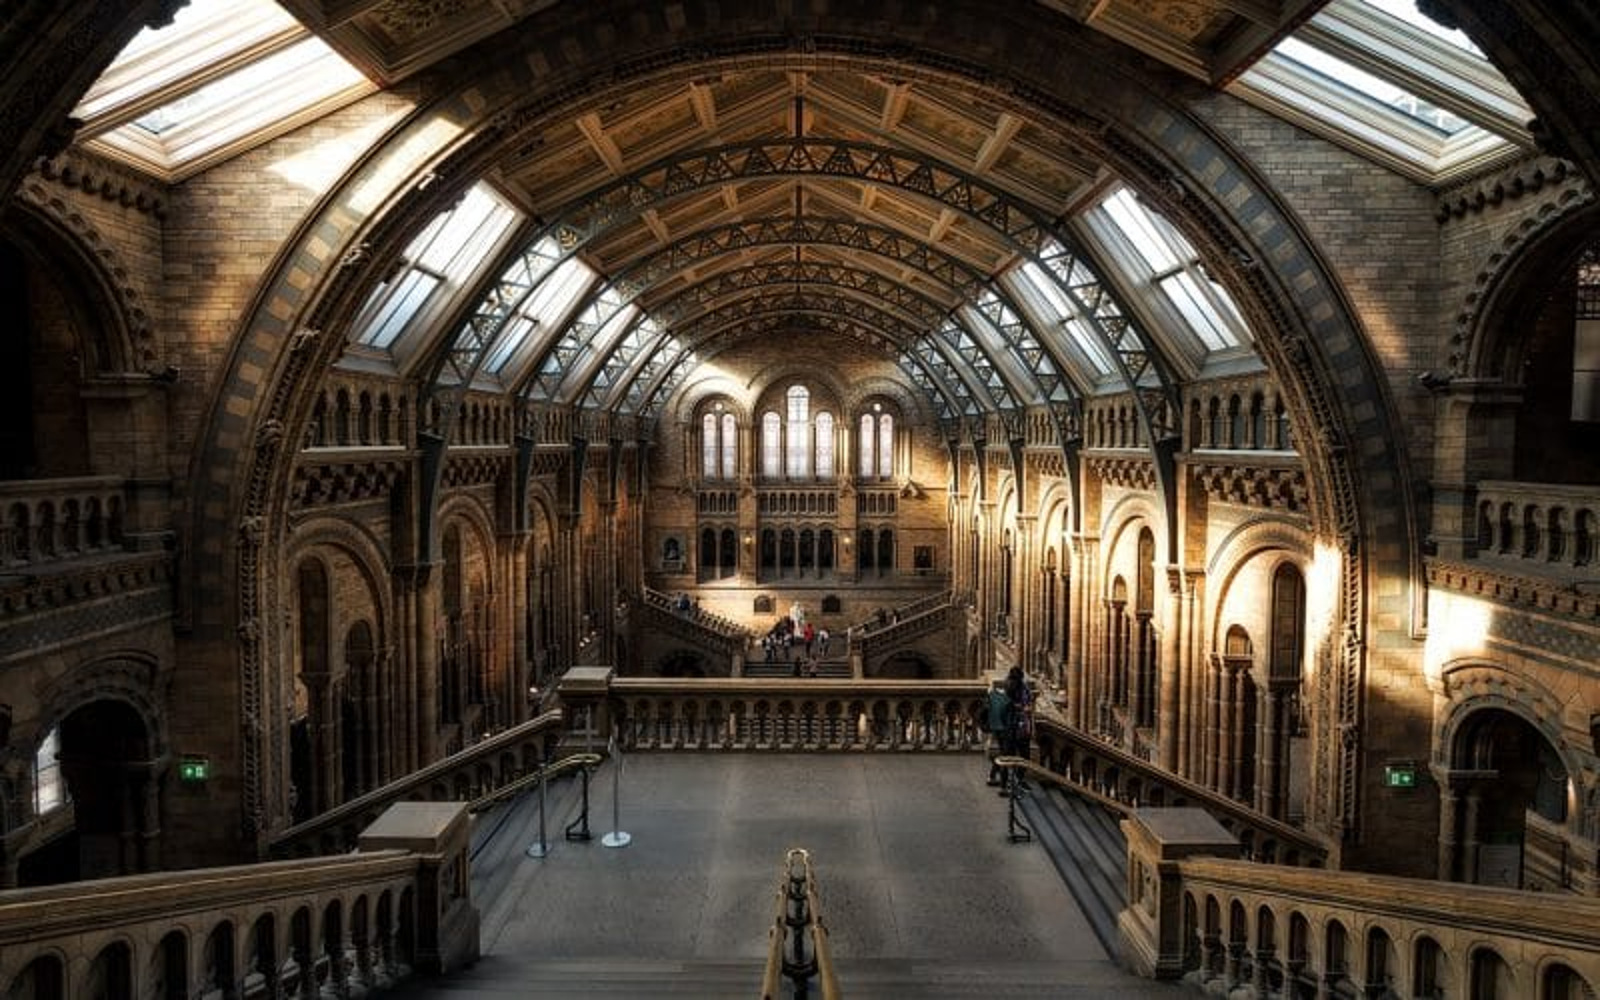 Horaires et tarifs du British Museum, Londres